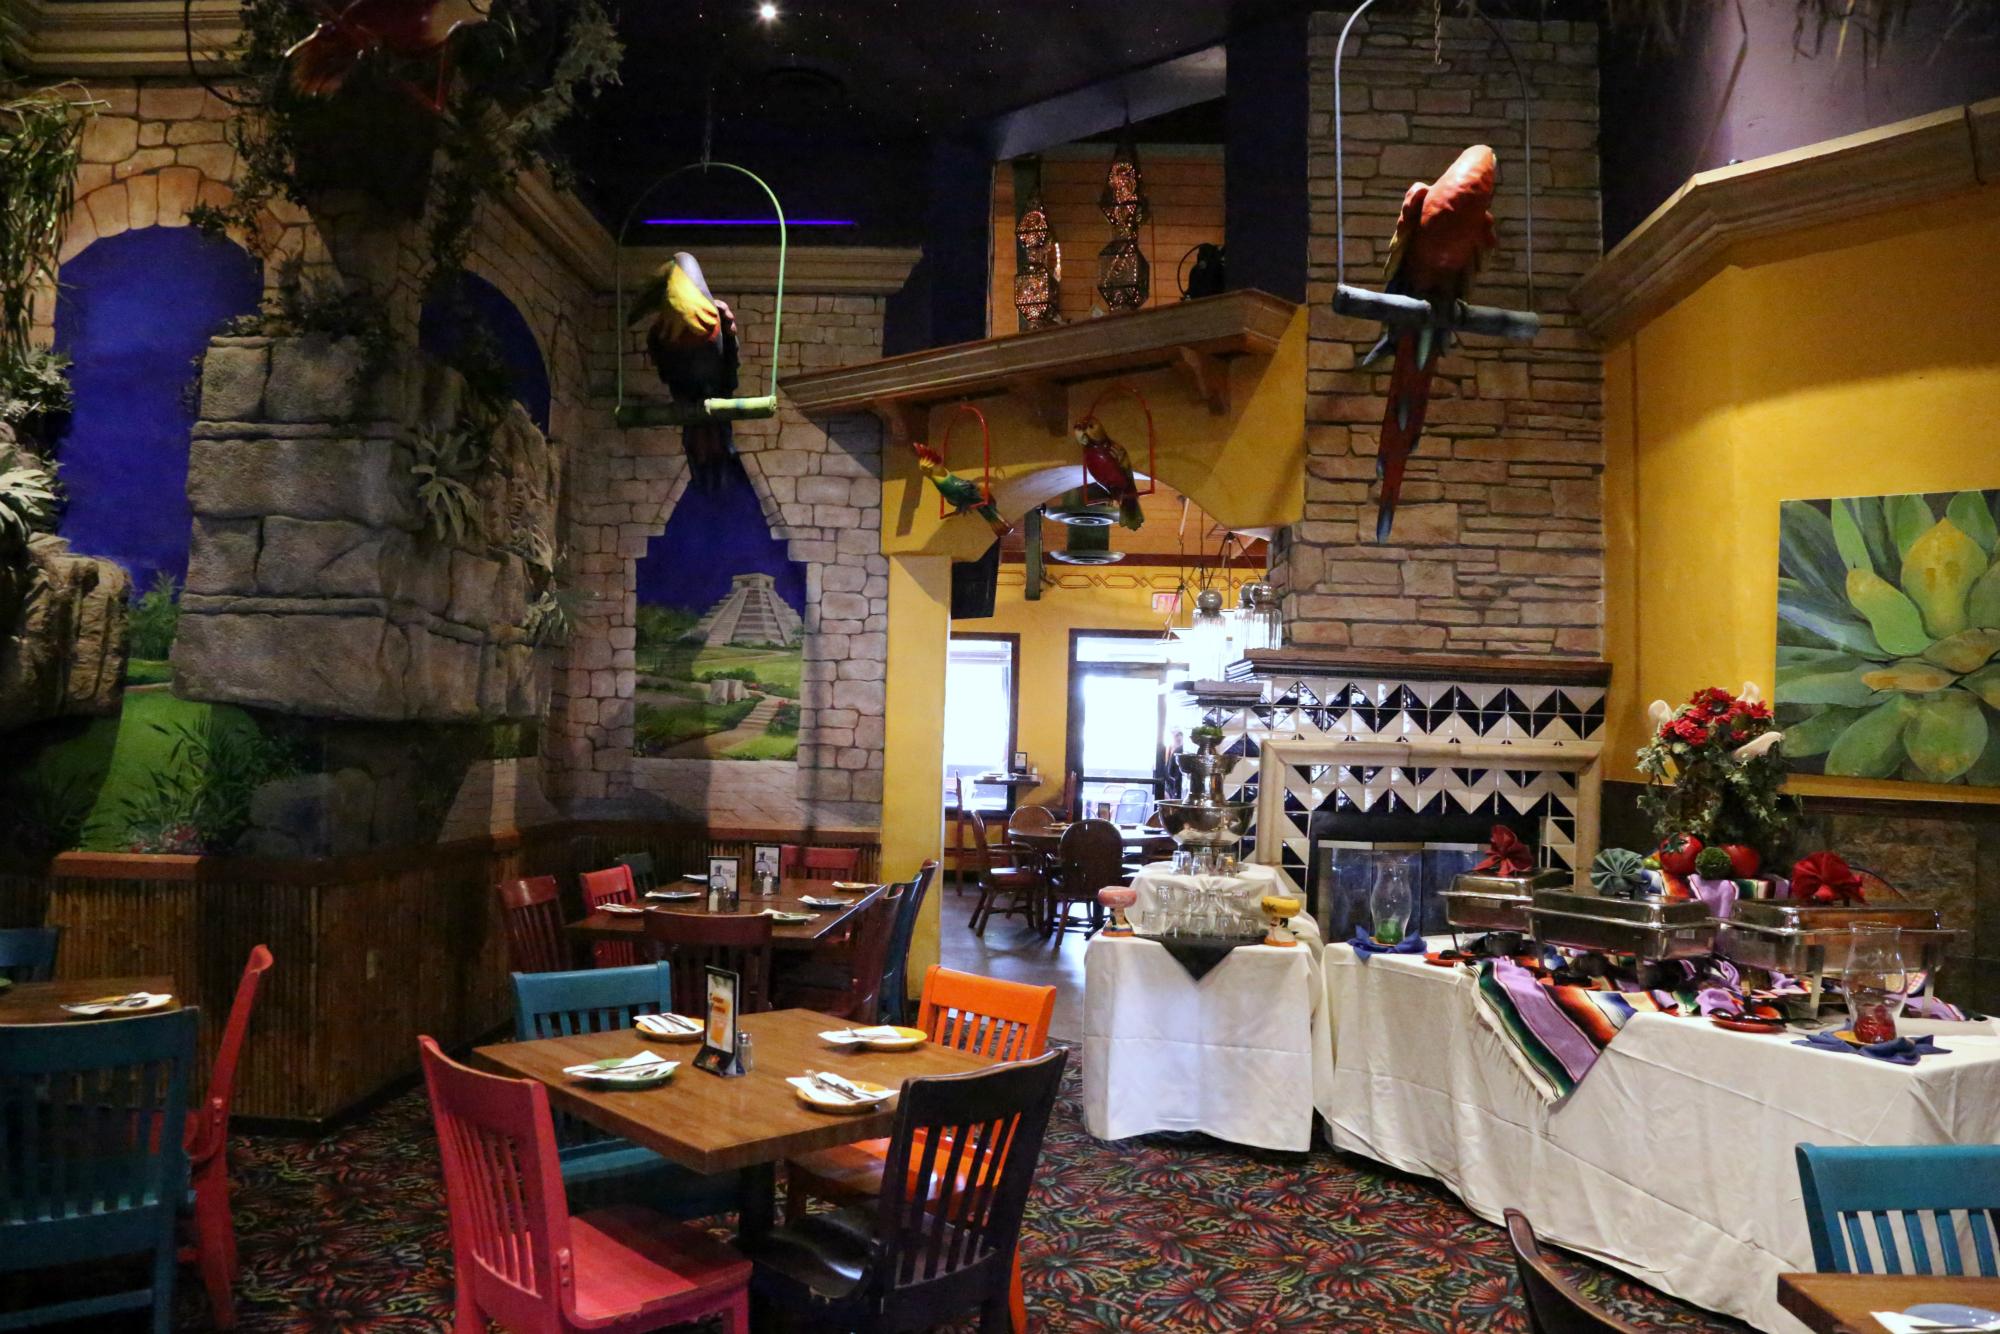 Macayo S Mexican Kitchen Glendale Az